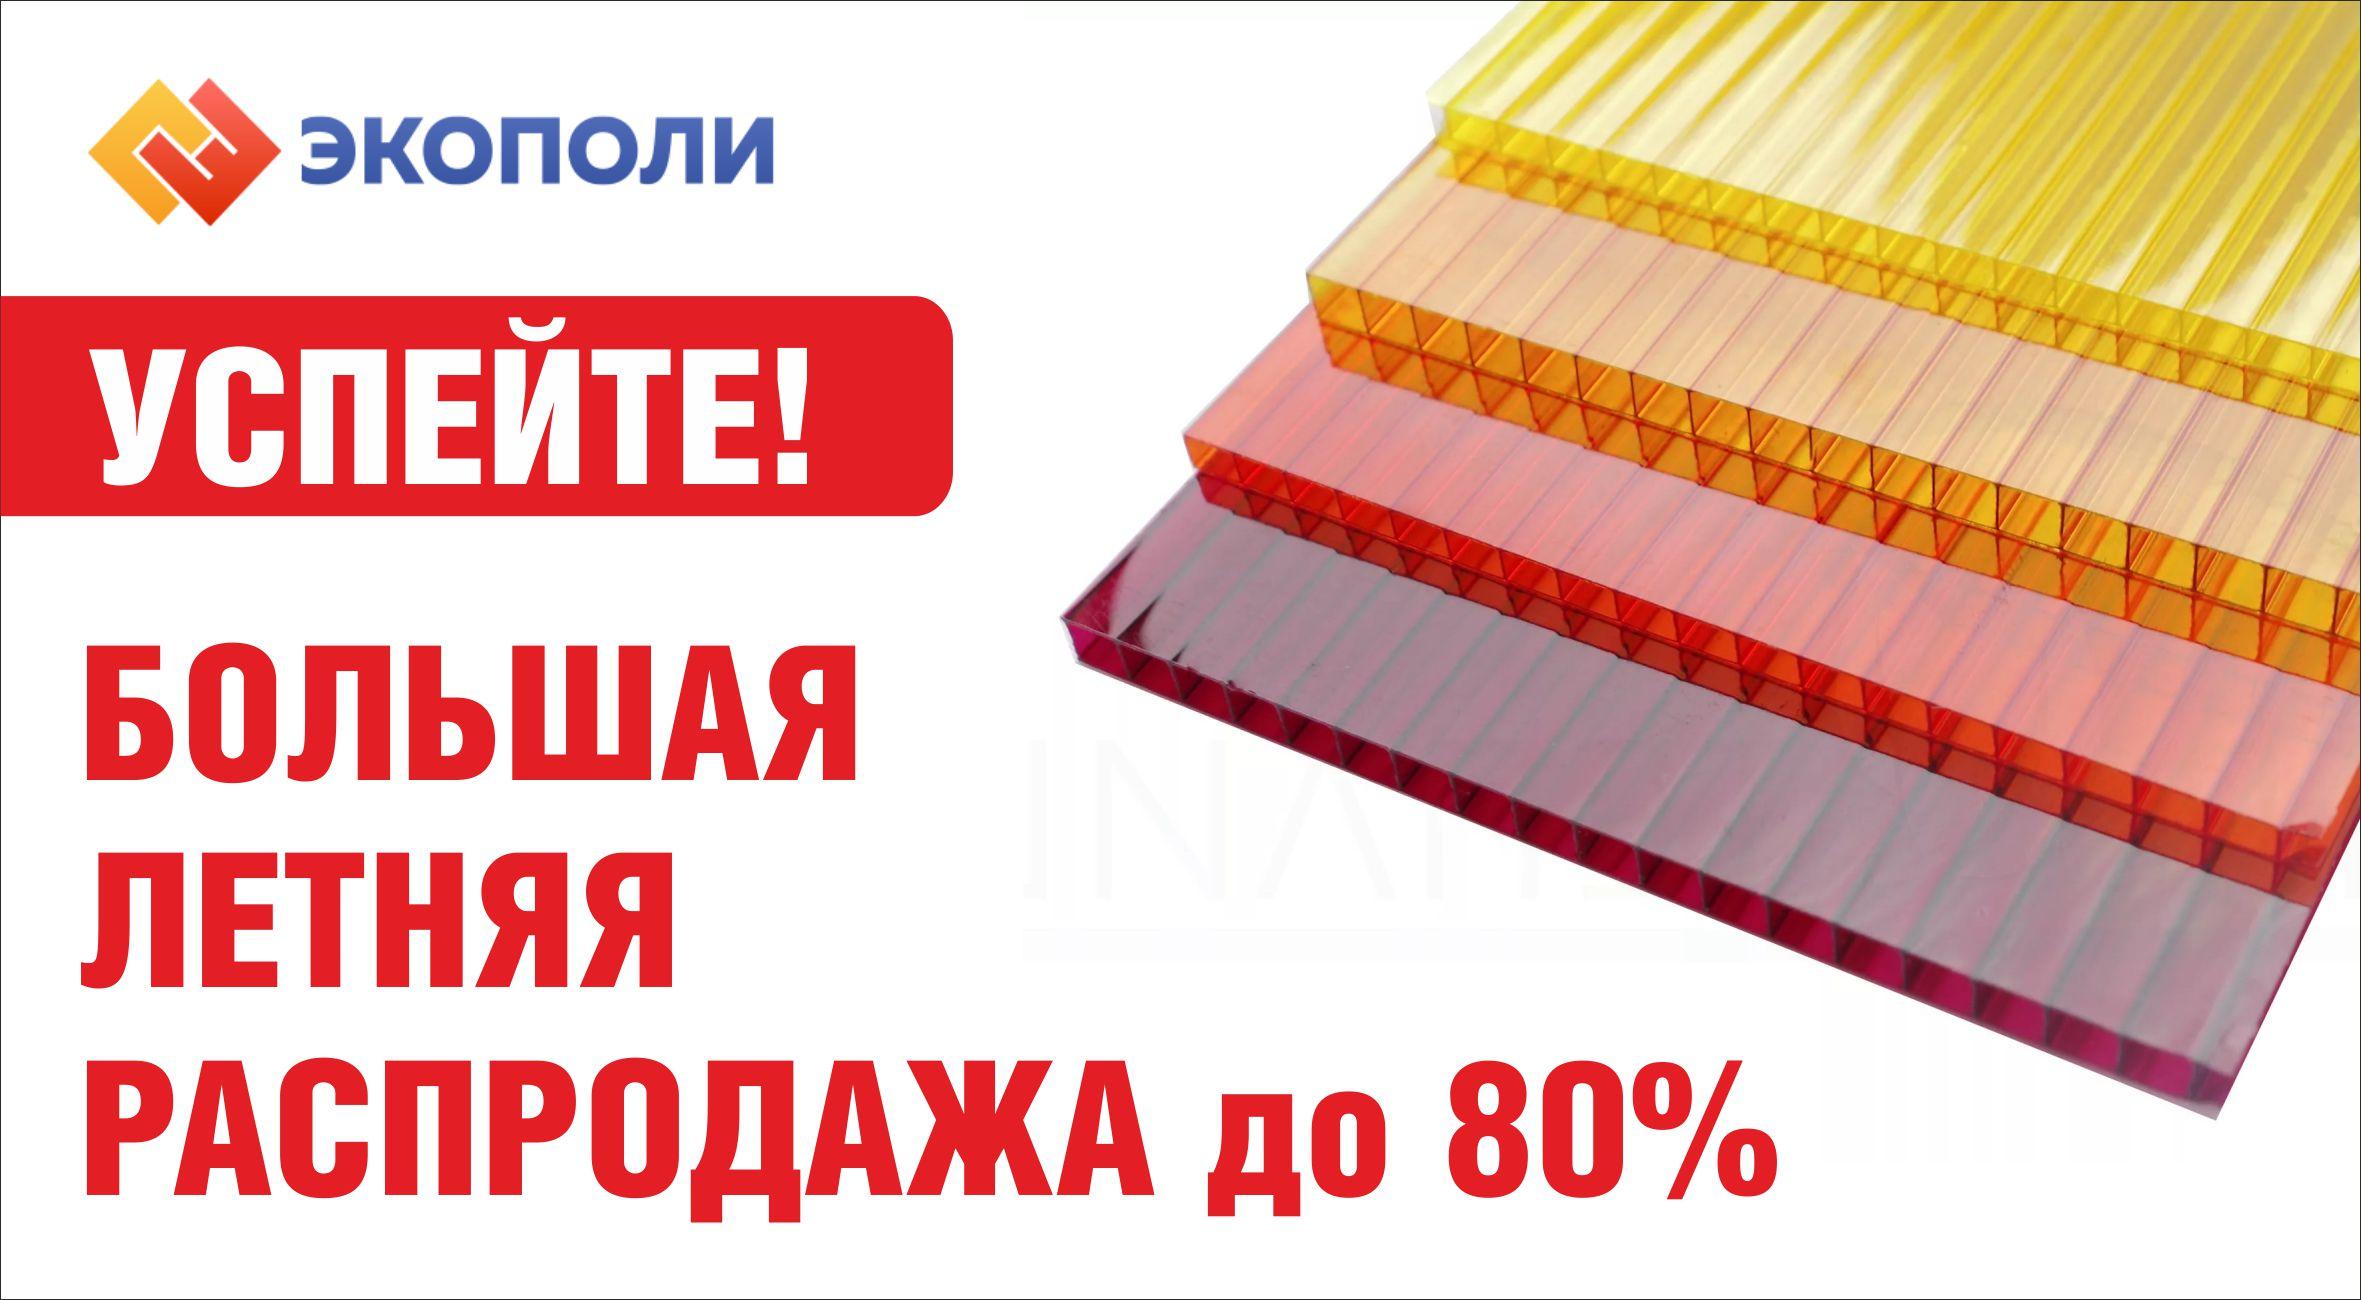 https://ecopoli.ru/images/upload/экополи.jpg